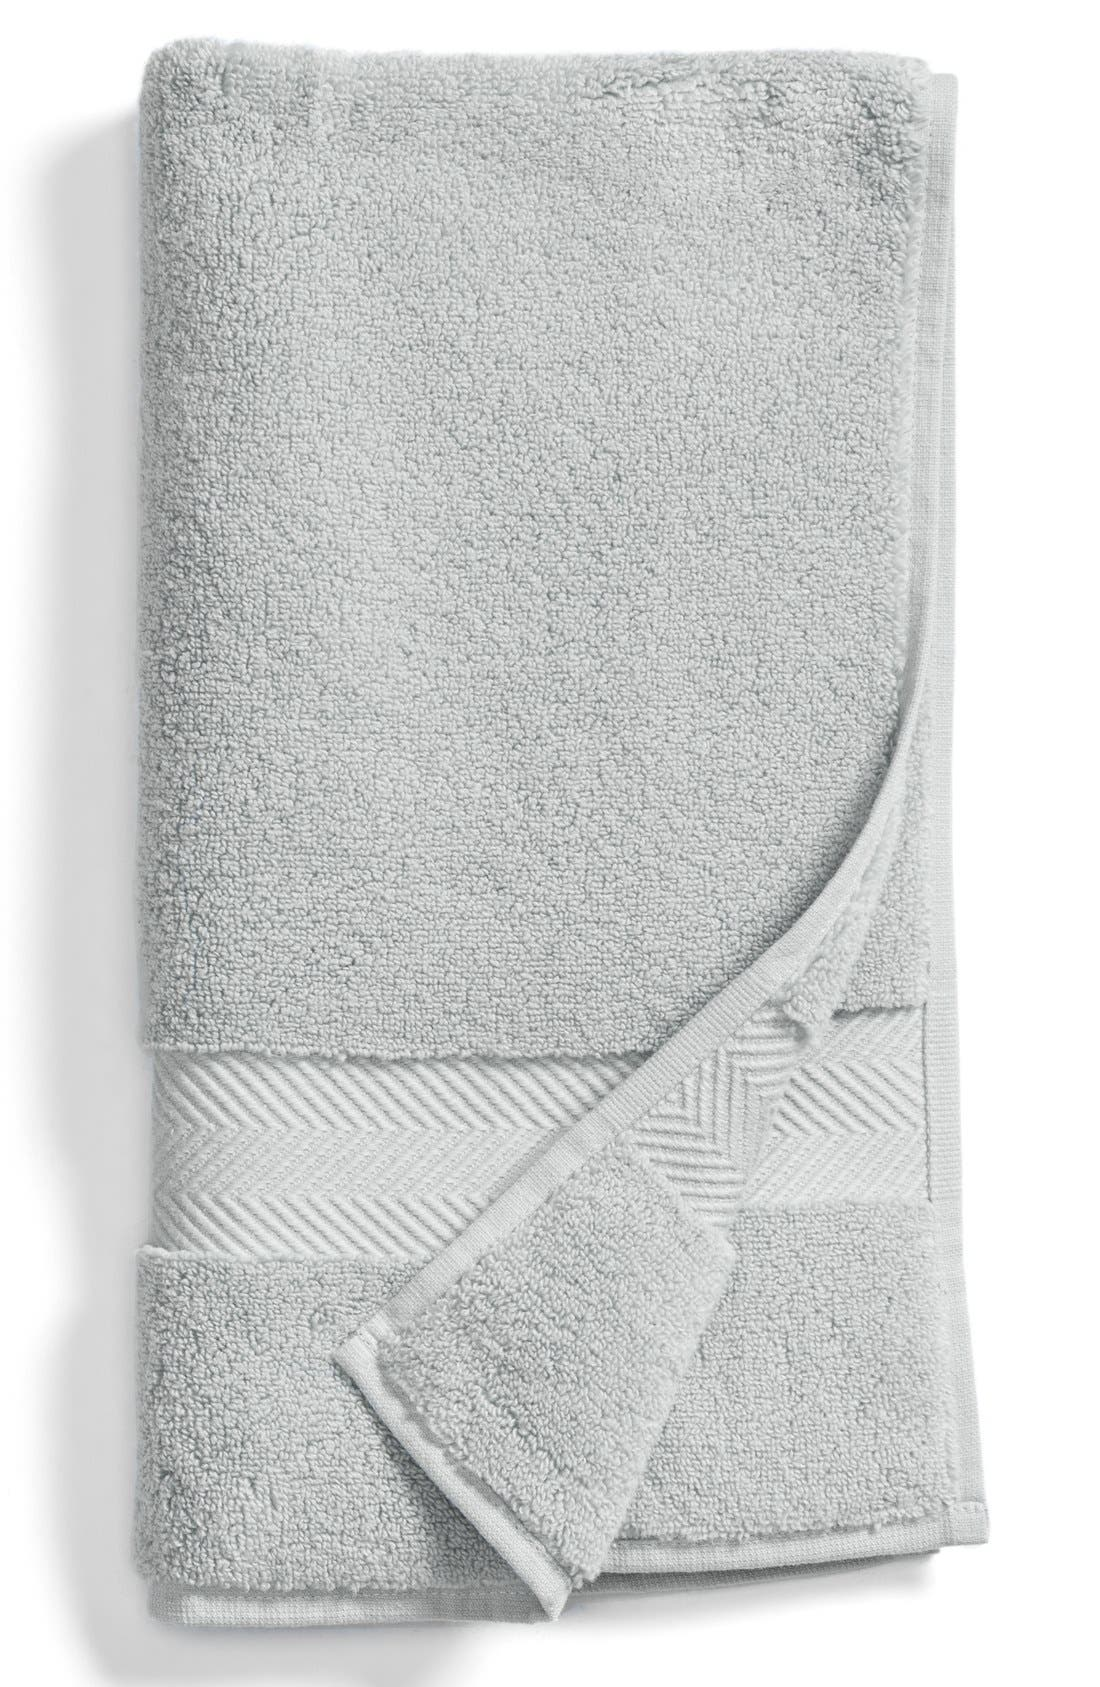 Hydrocotton Hand Towel,                             Main thumbnail 1, color,                             Grey Vapor